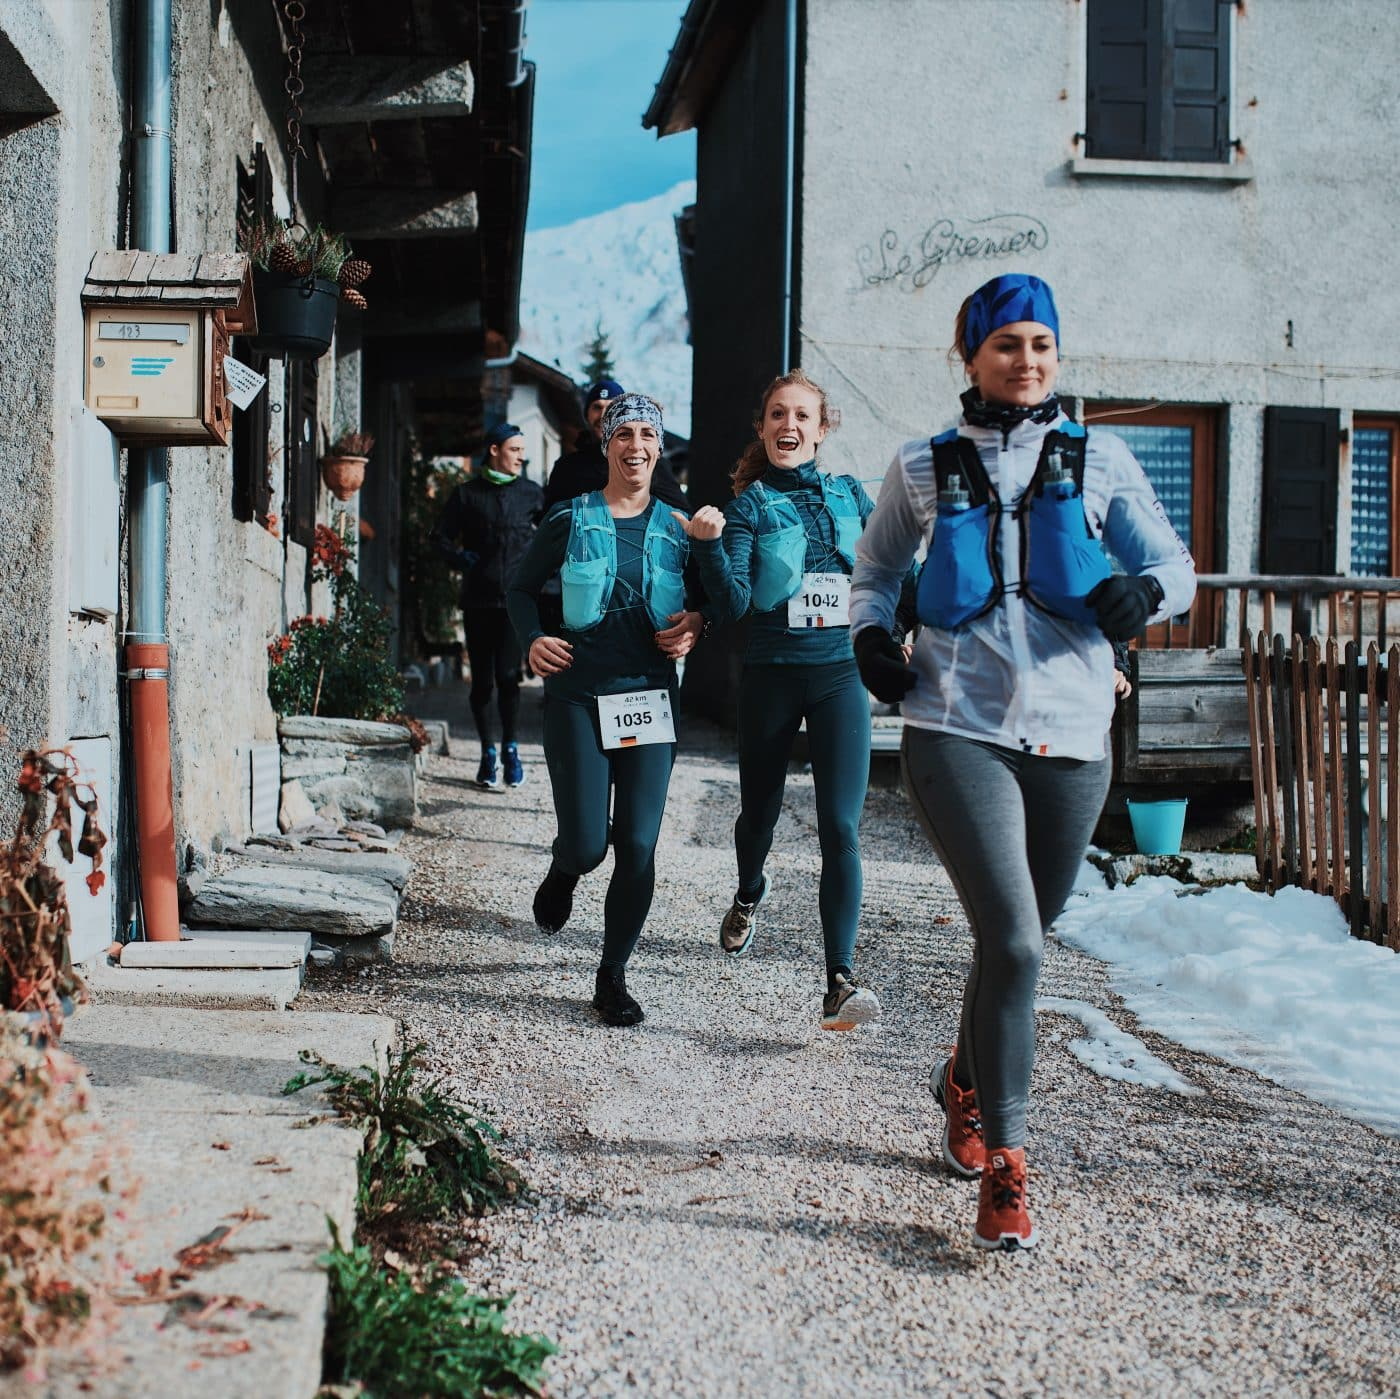 Salomon-Unpexpected-Weekeend-anais-leroy-runpack-4